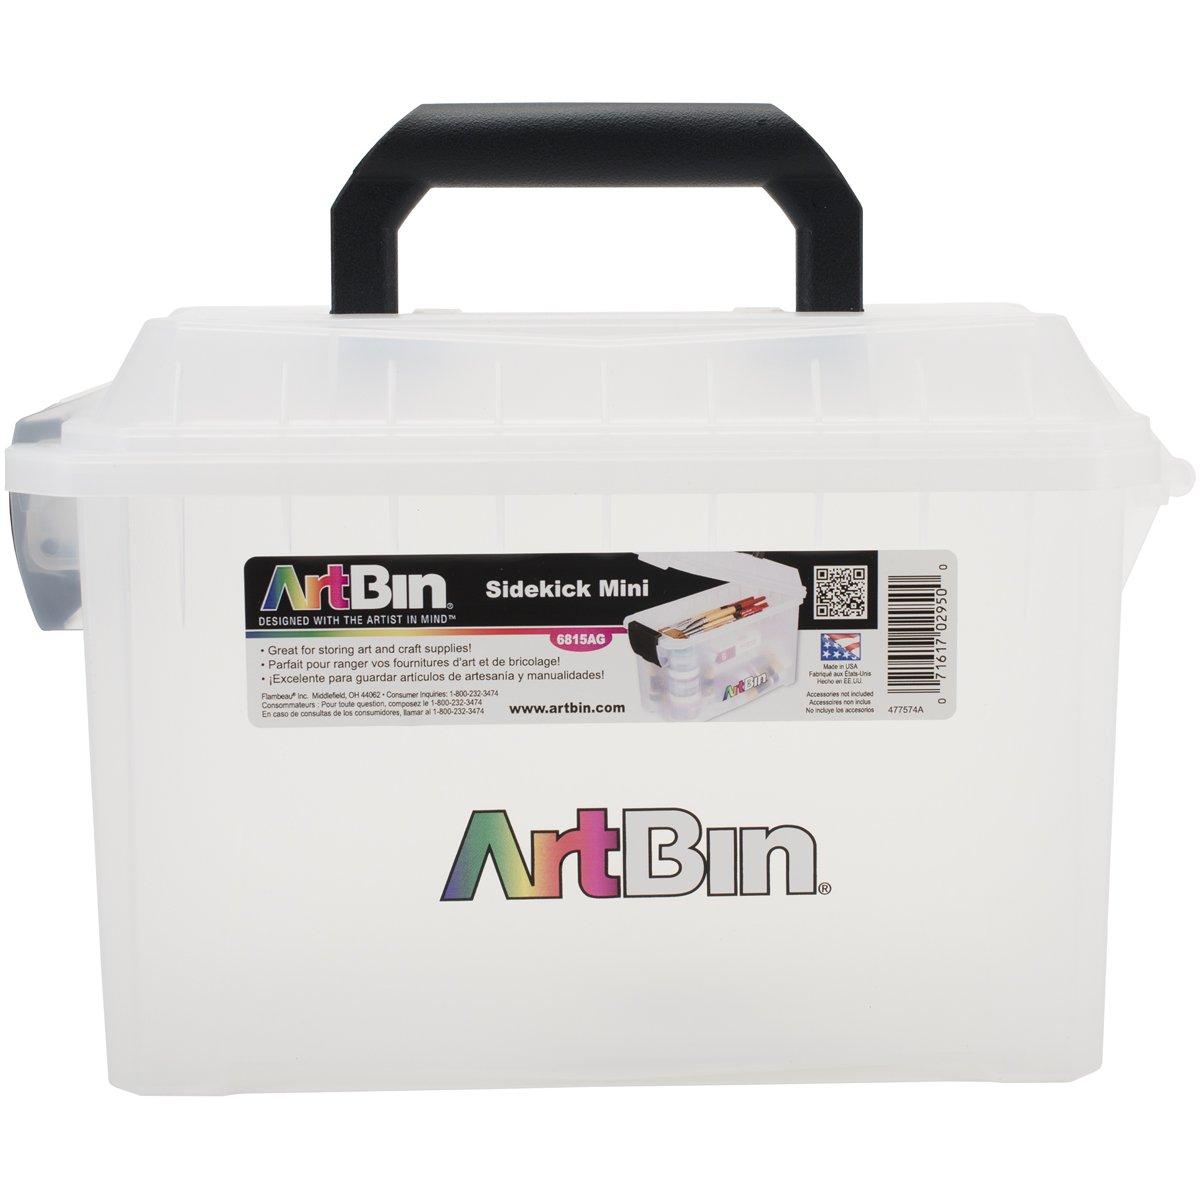 ArtBin Mini Sidekick Storage Box- Art/ Craft Supply Storage Container, 6815AG